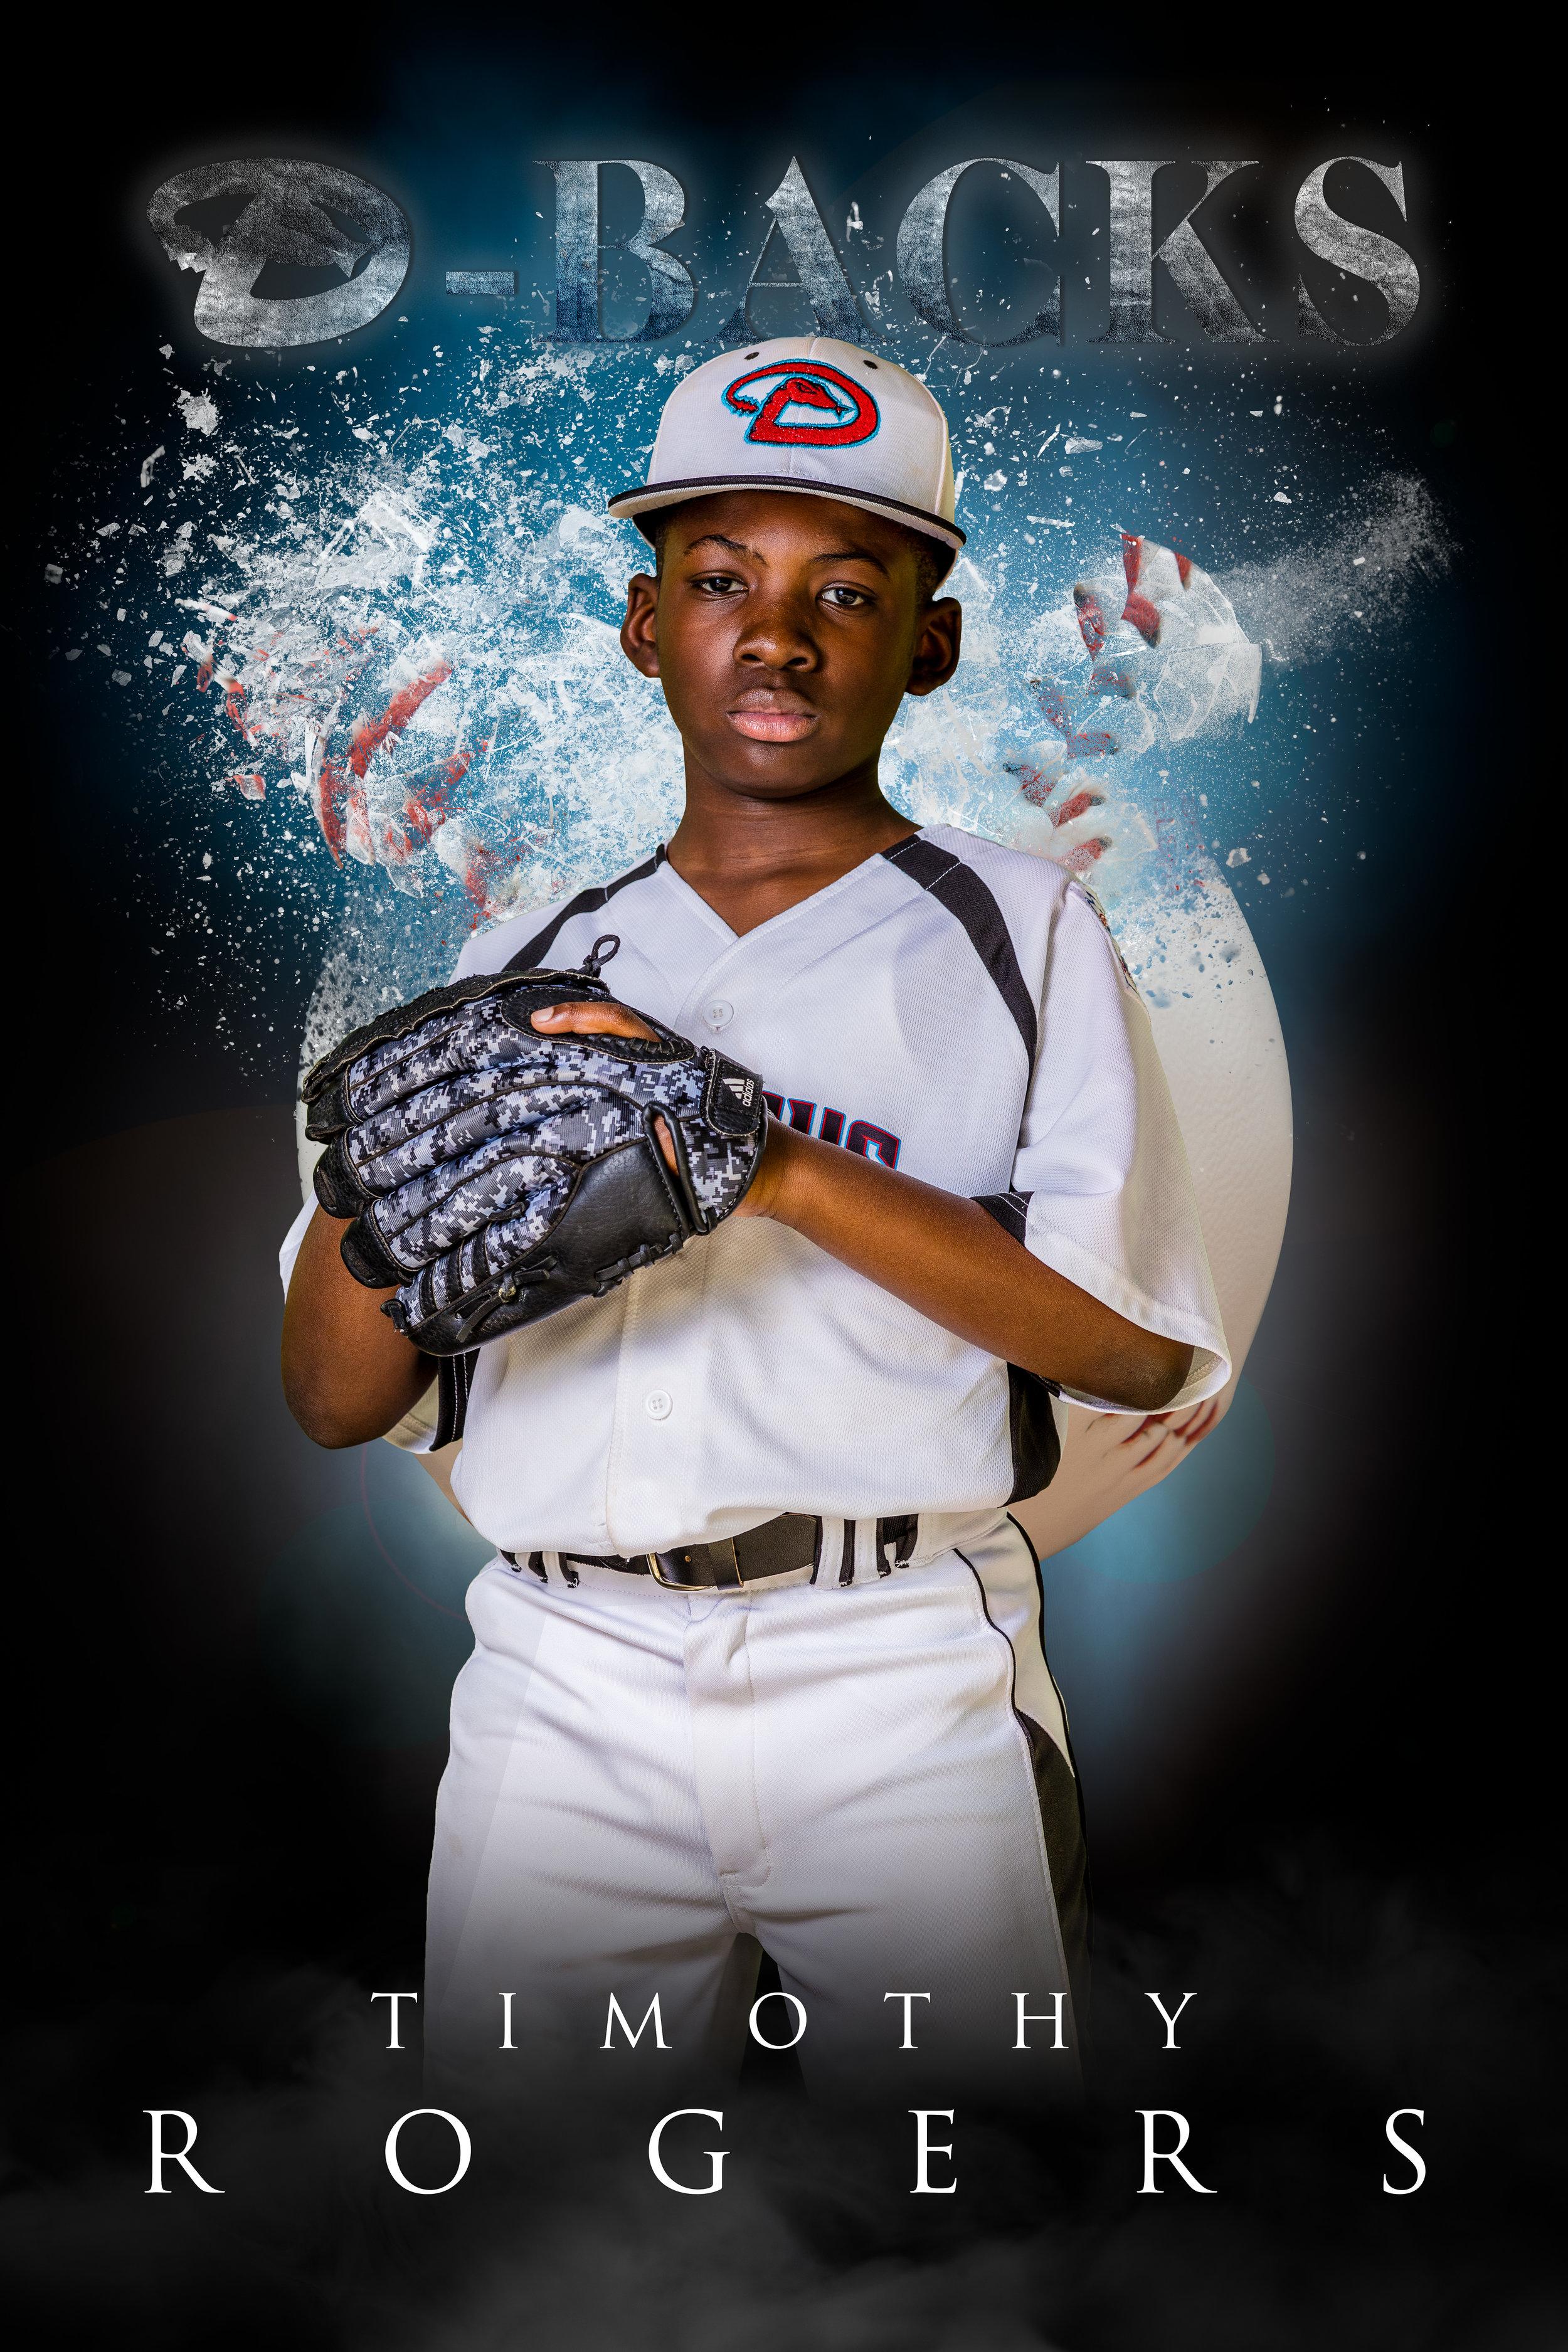 Timothy Baseball-2 20x30.jpg